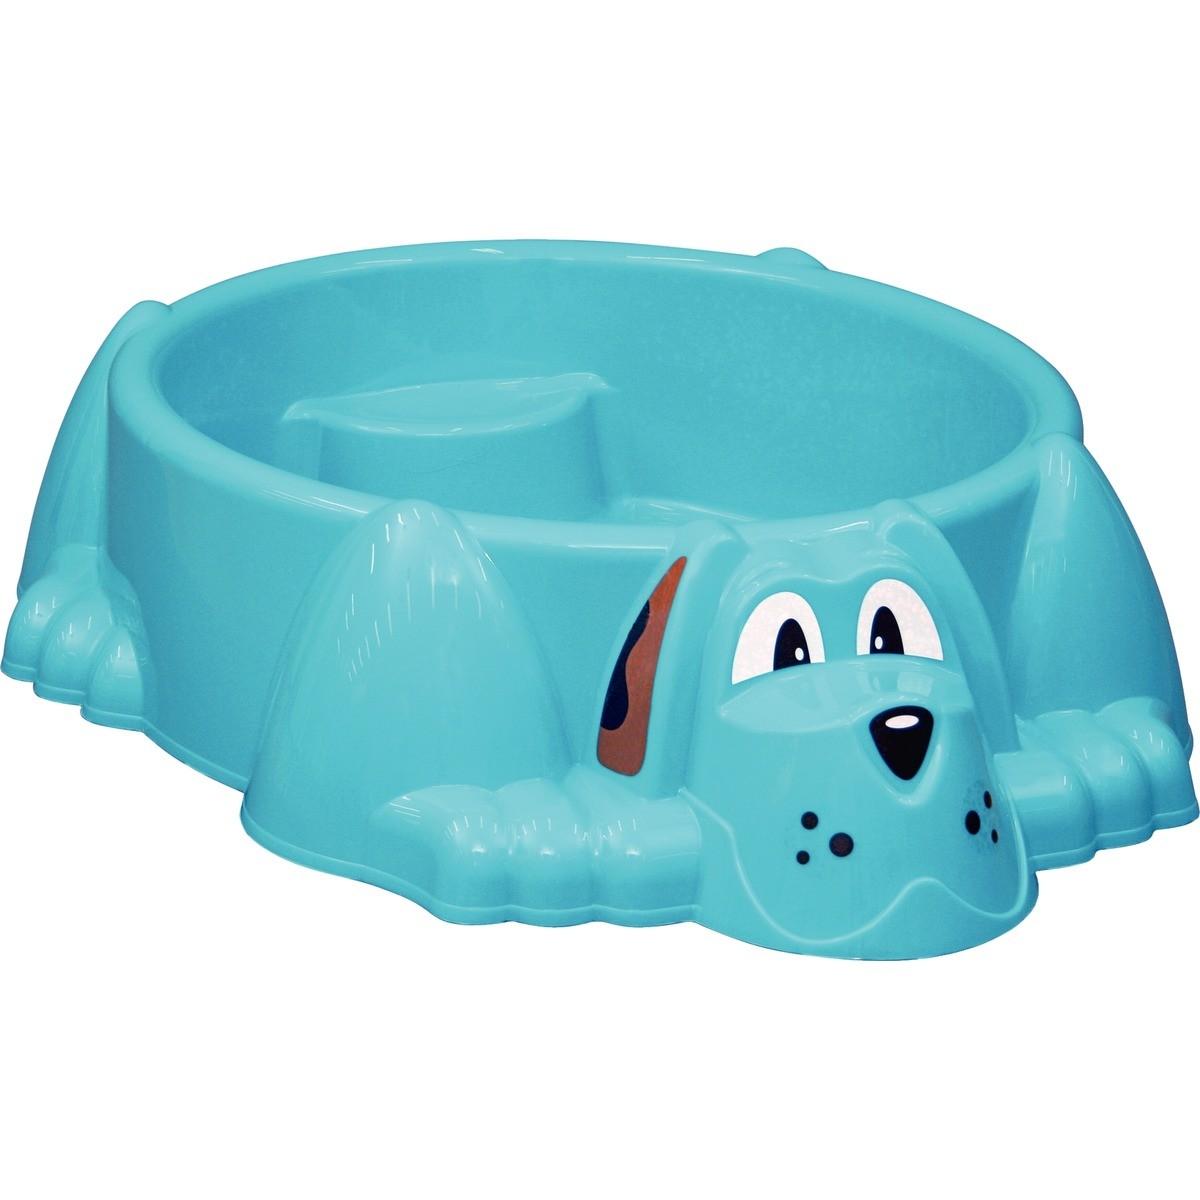 Piscina Aquadog Ref. 92122 070 Tramontina Azul